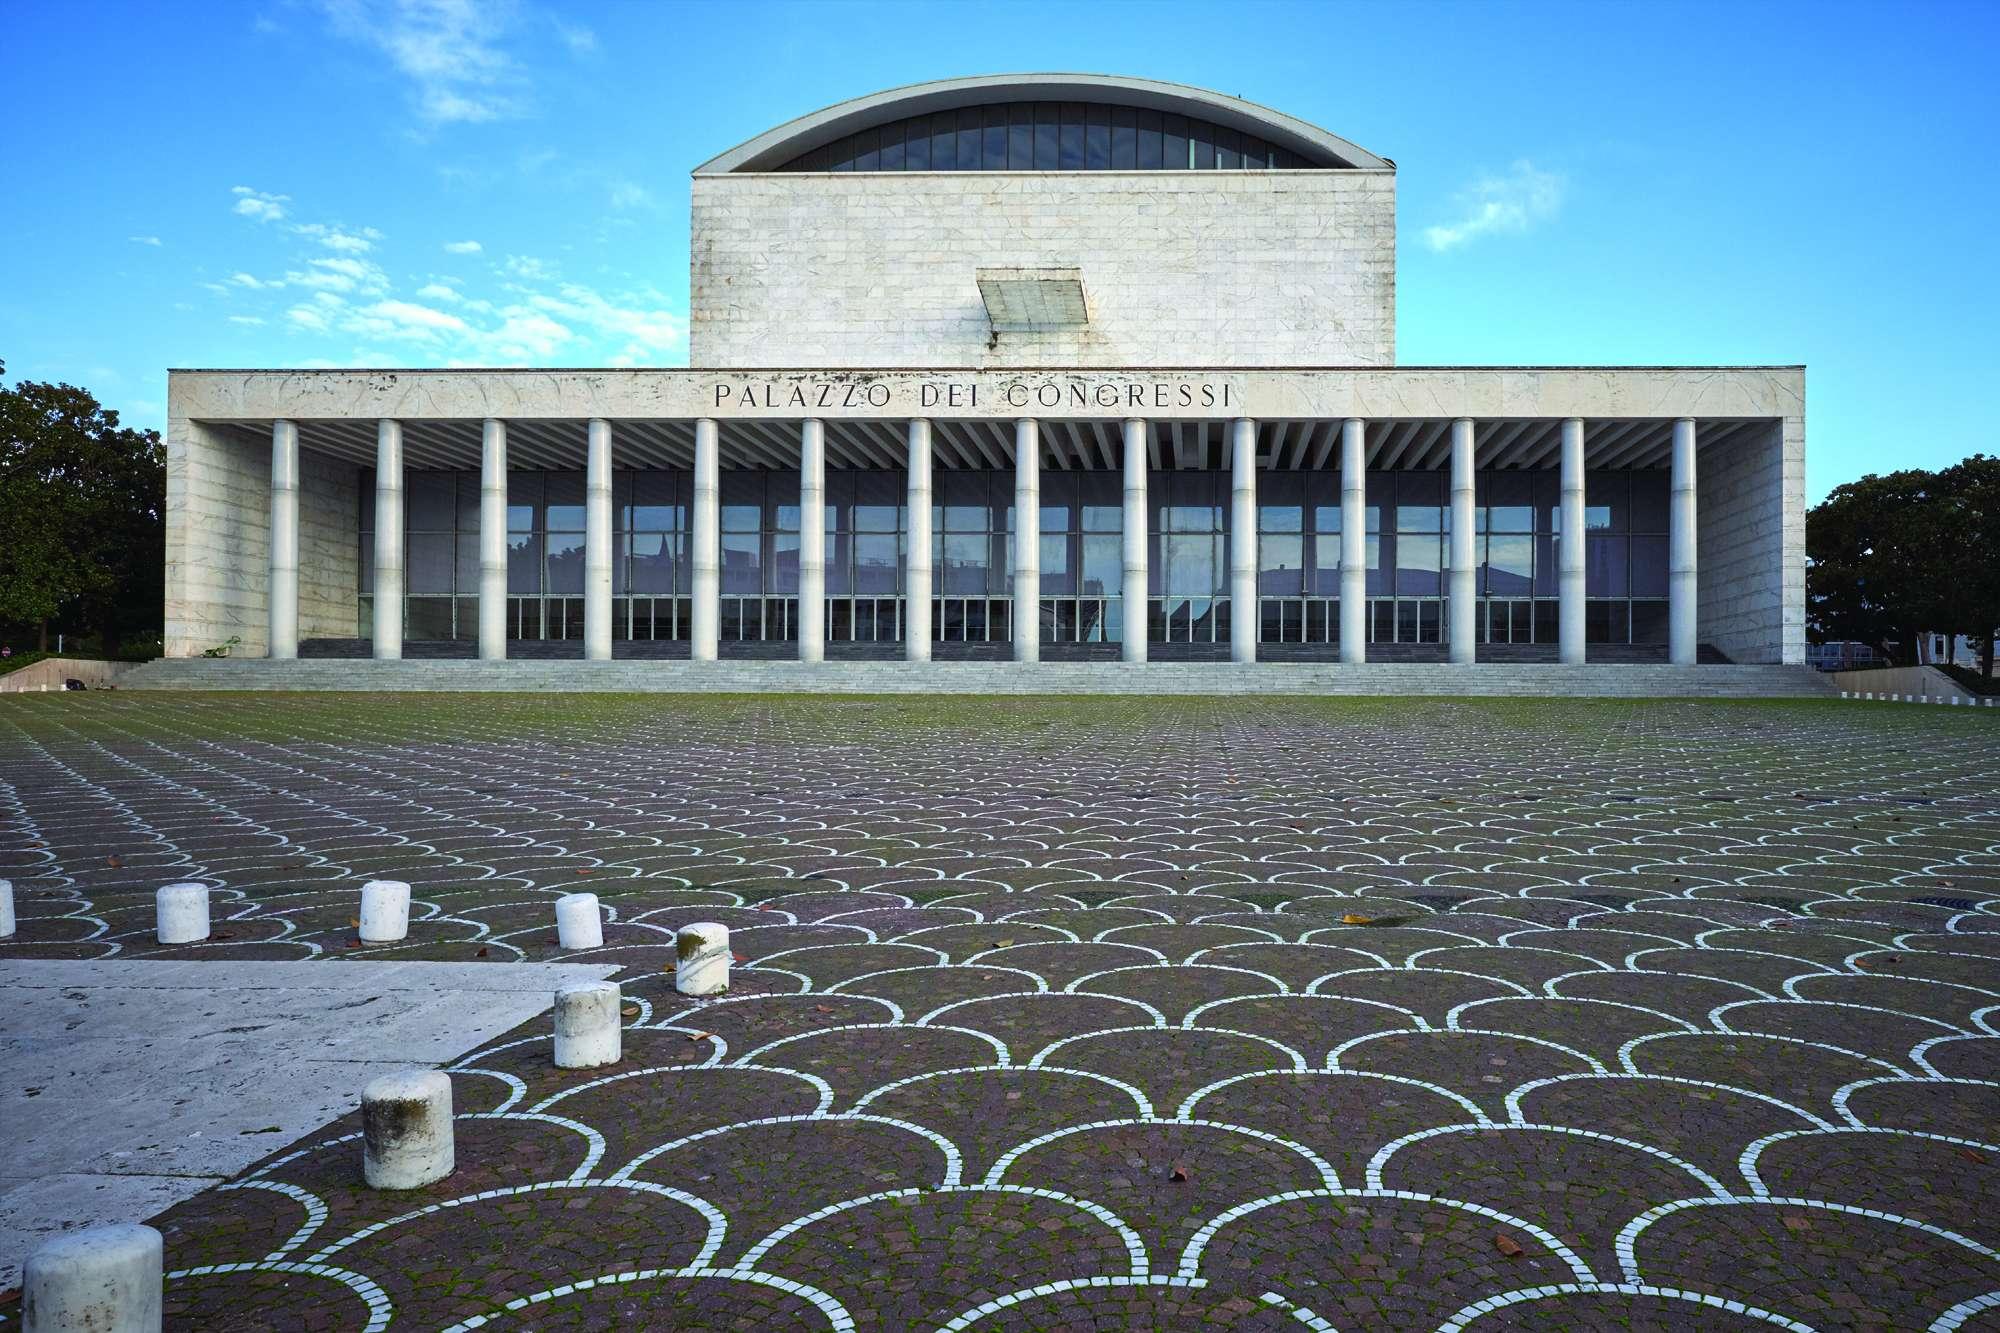 edu rome eur palace congress